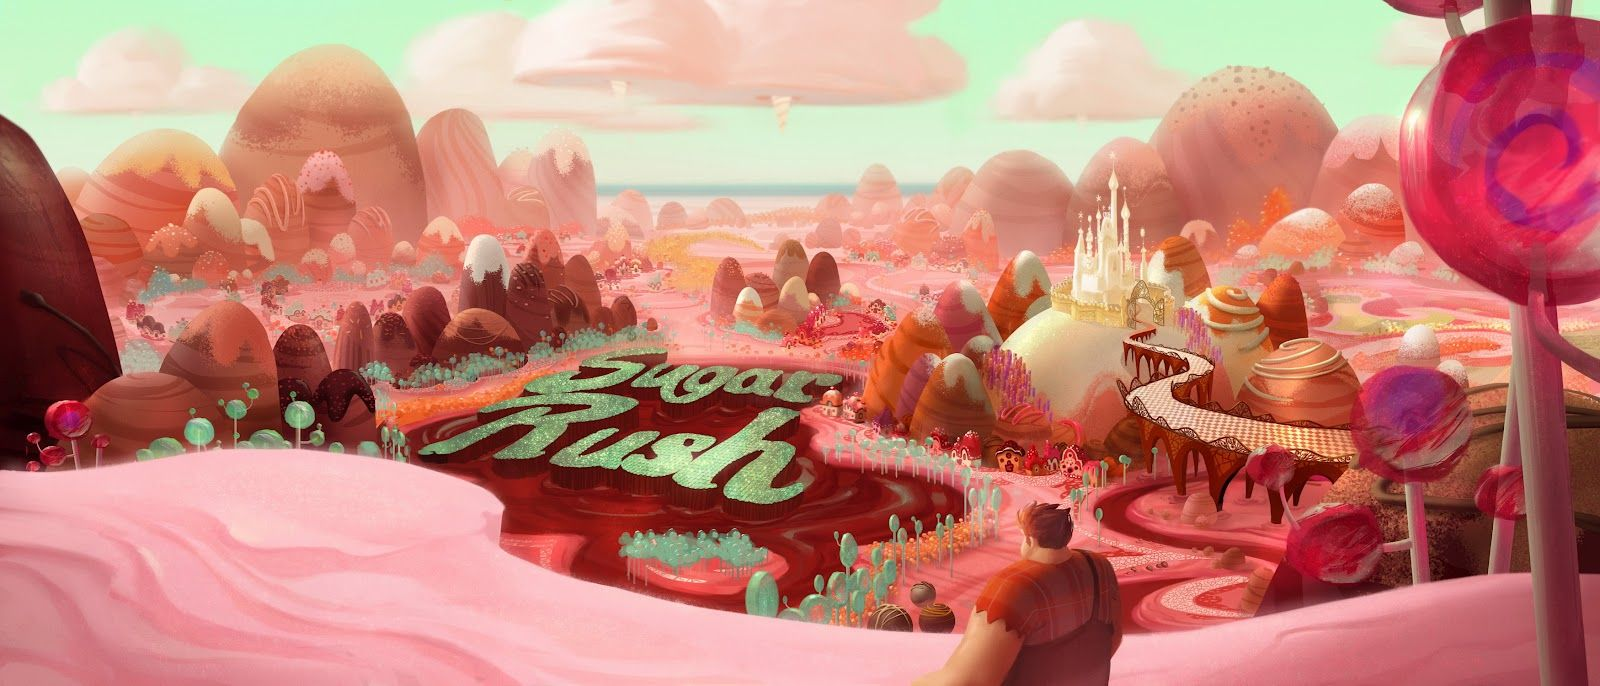 Wreck It Ralph Sugar Rush Castle Google Search Candy